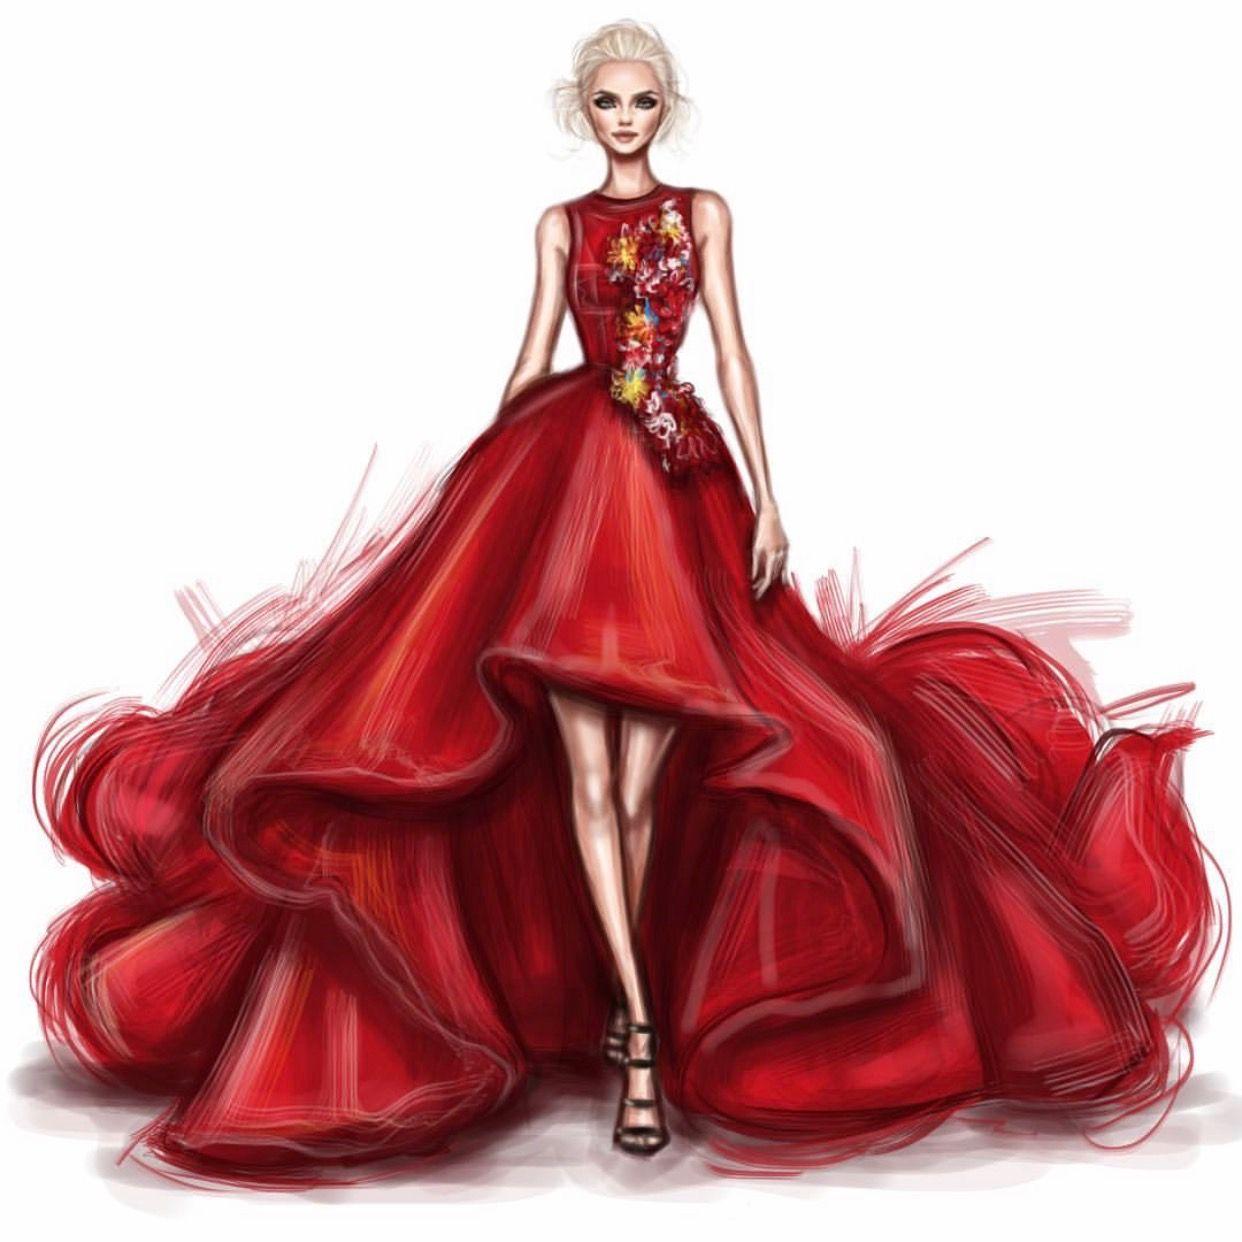 8 #Panvel #NewPanvel #Thane #Uran #Raigad #Roha #Airoli #Dronagiri #Ghansoli #Kalamboli #Kamothe #KoparKhairane #Ulwe #फॅशन #इंटिरिअर #सिलाईं #नेरूळ #नवीमुंबई #करिअर.jpg